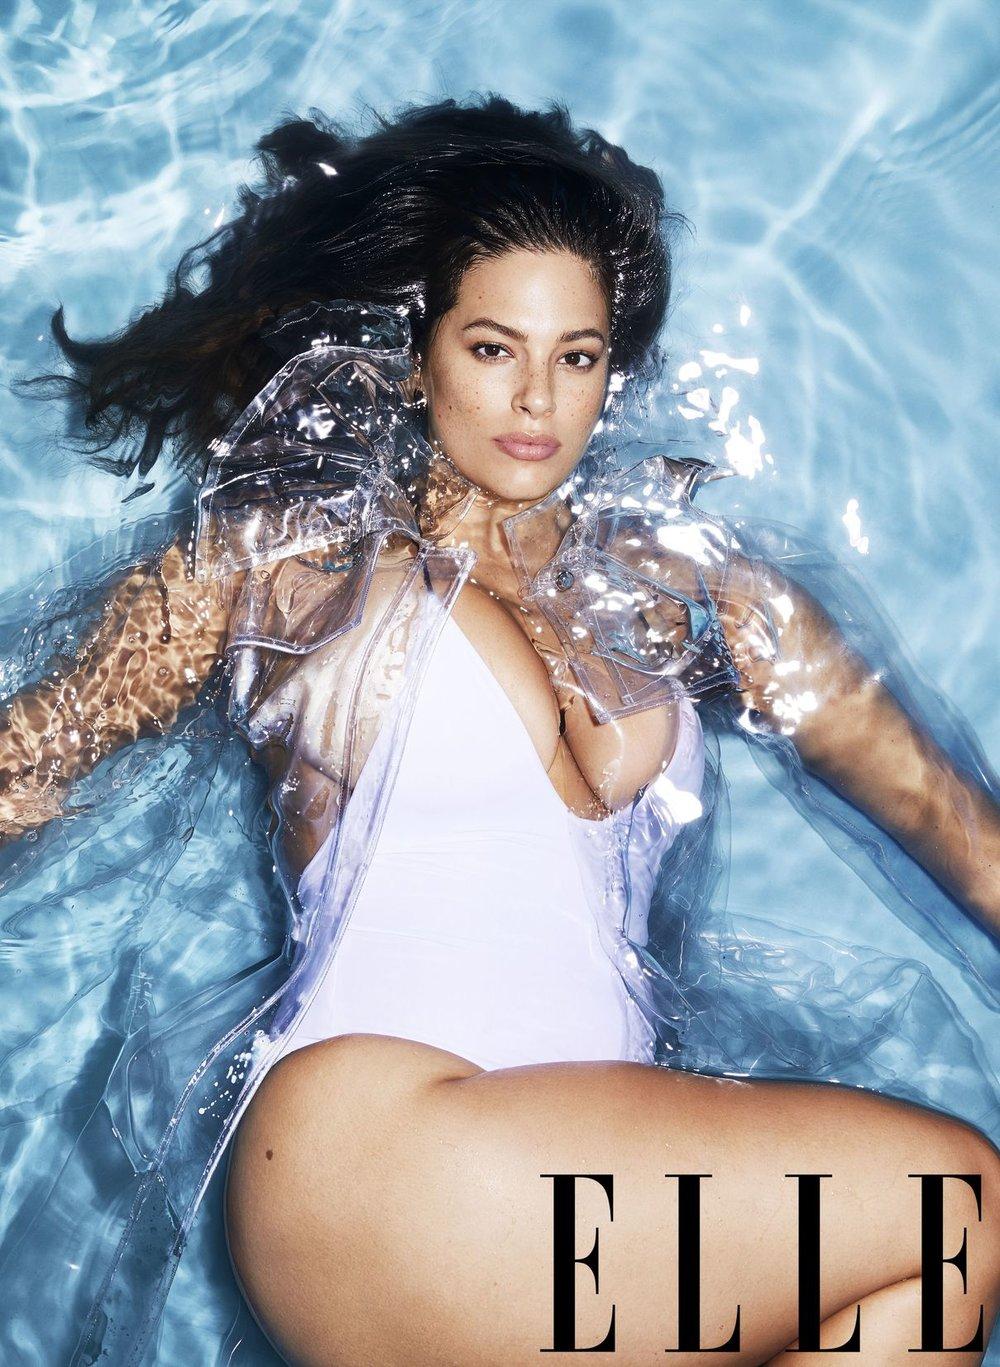 Pics Ola Rudnicka nudes (29 photos), Ass, Is a cute, Twitter, in bikini 2020